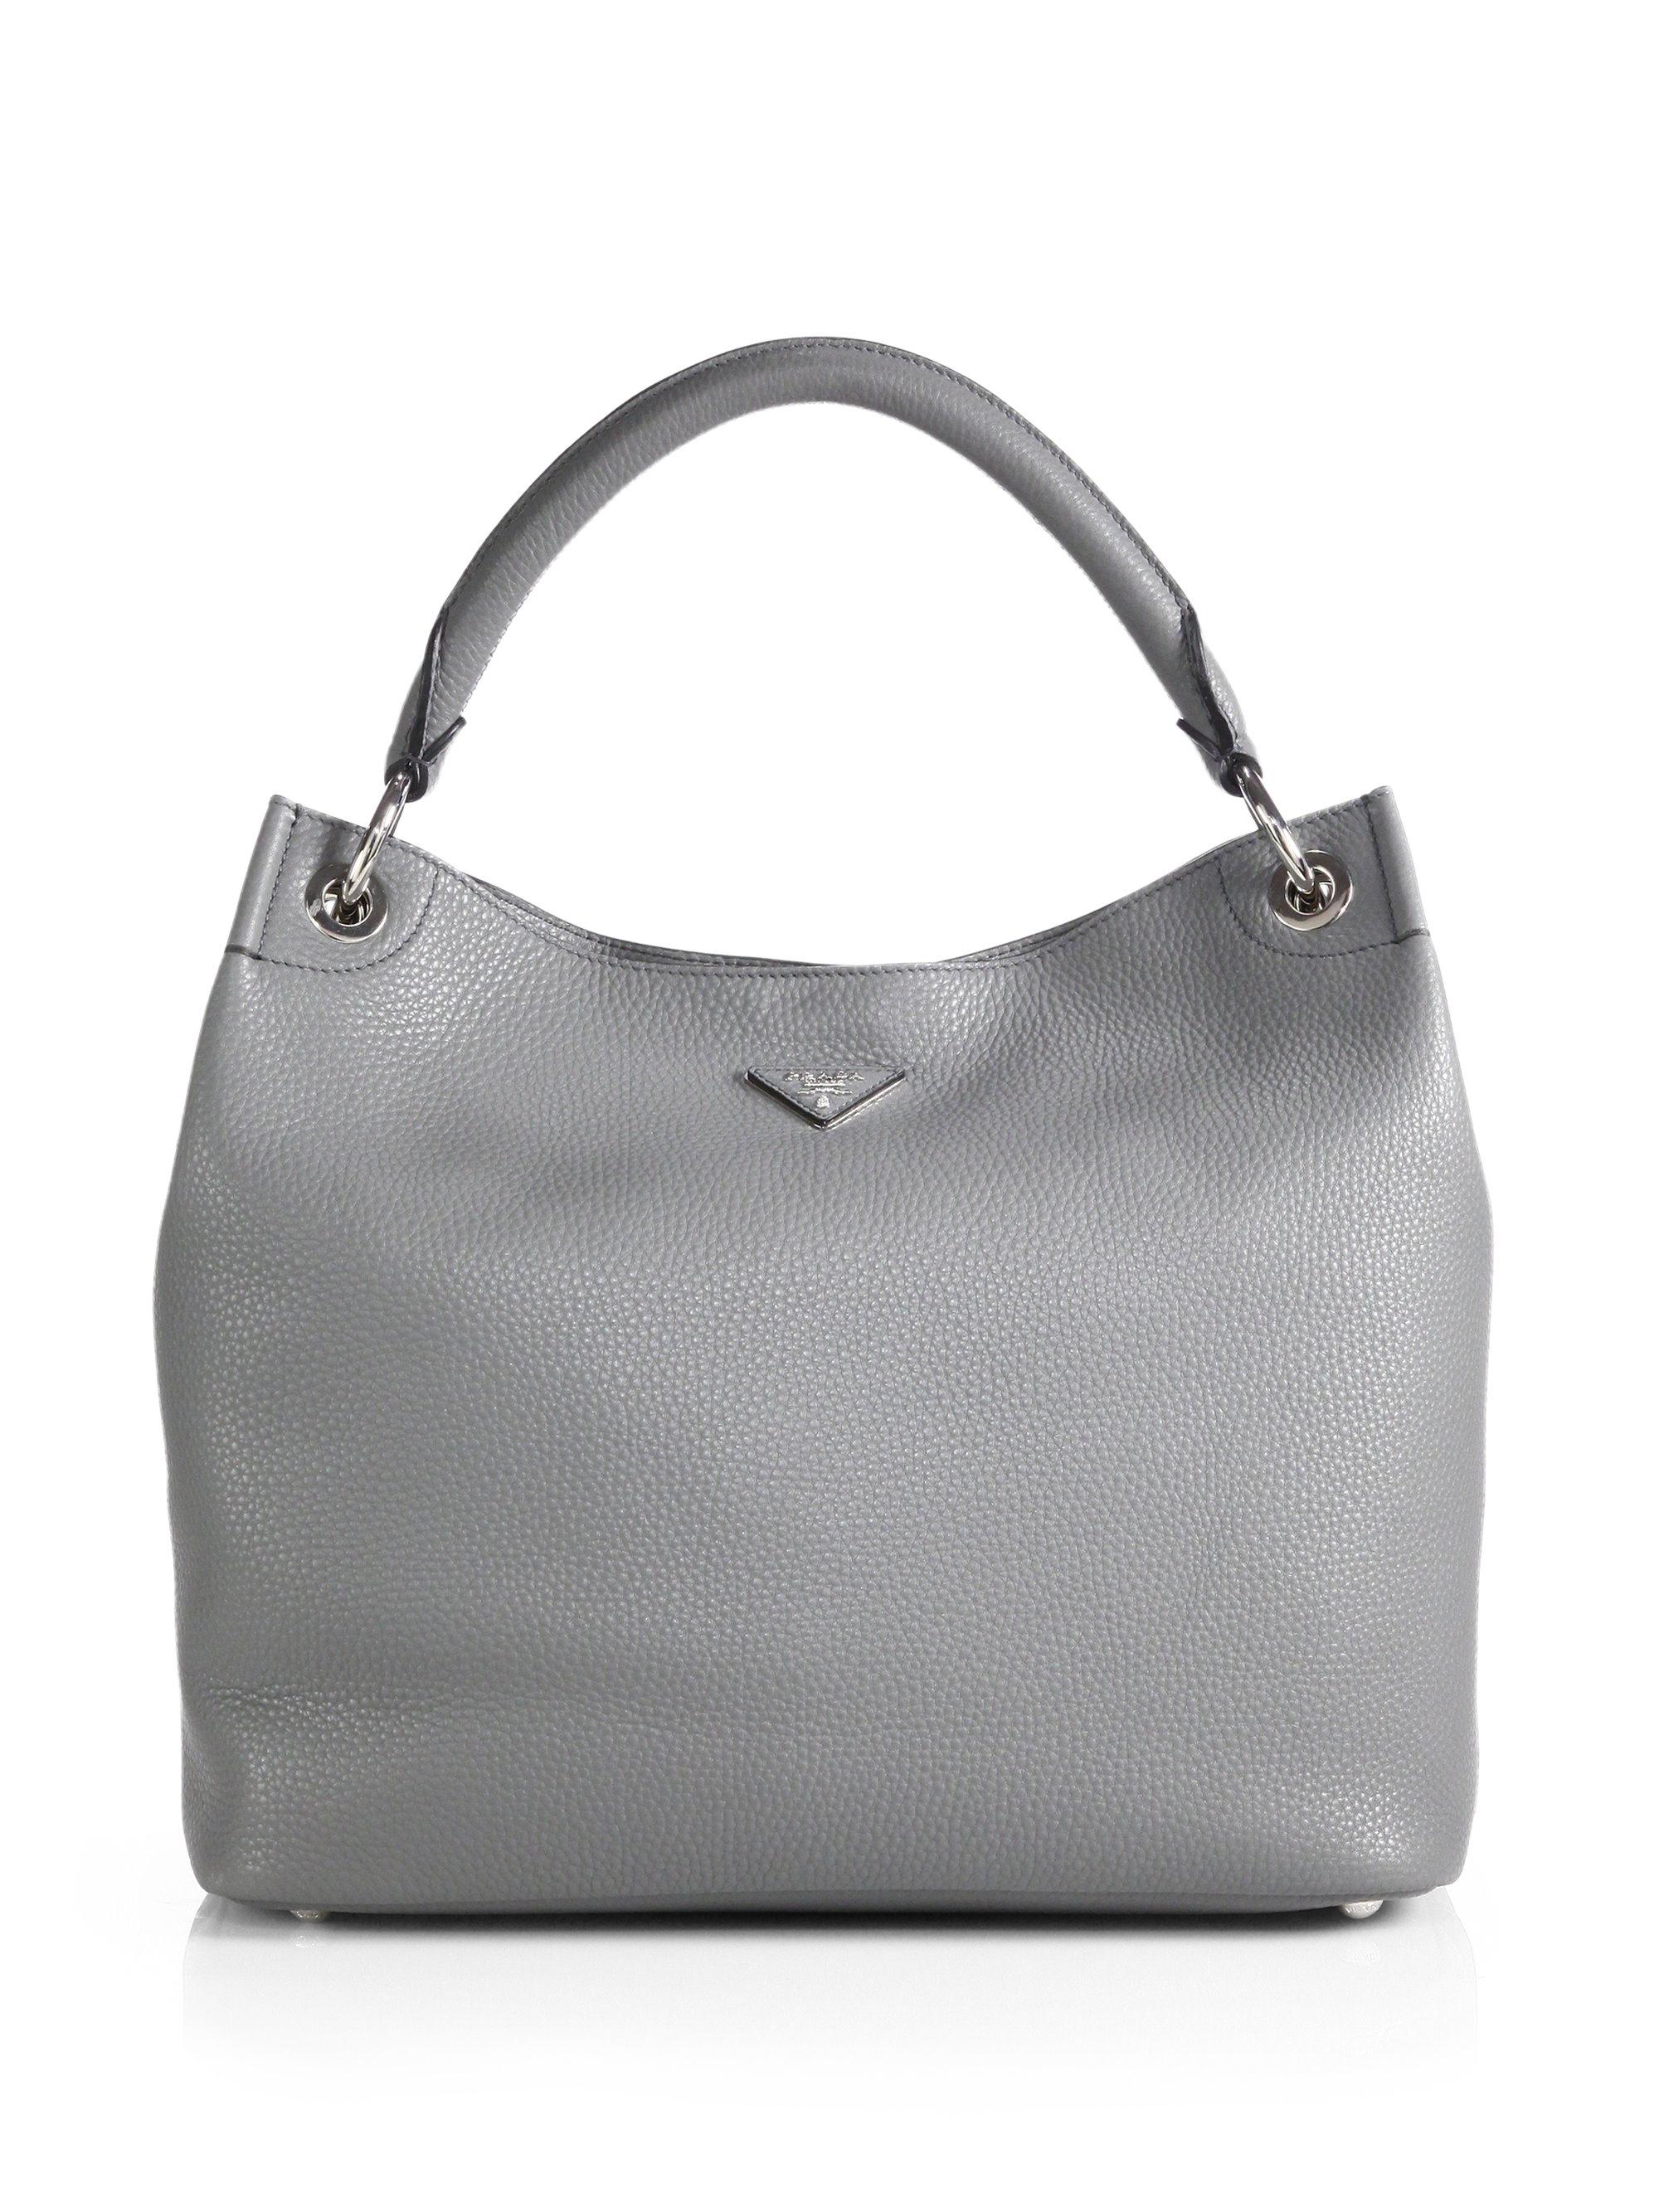 purple prada purse - Prada Daino Large Hobo Bag in Gray (MARMO) | Lyst